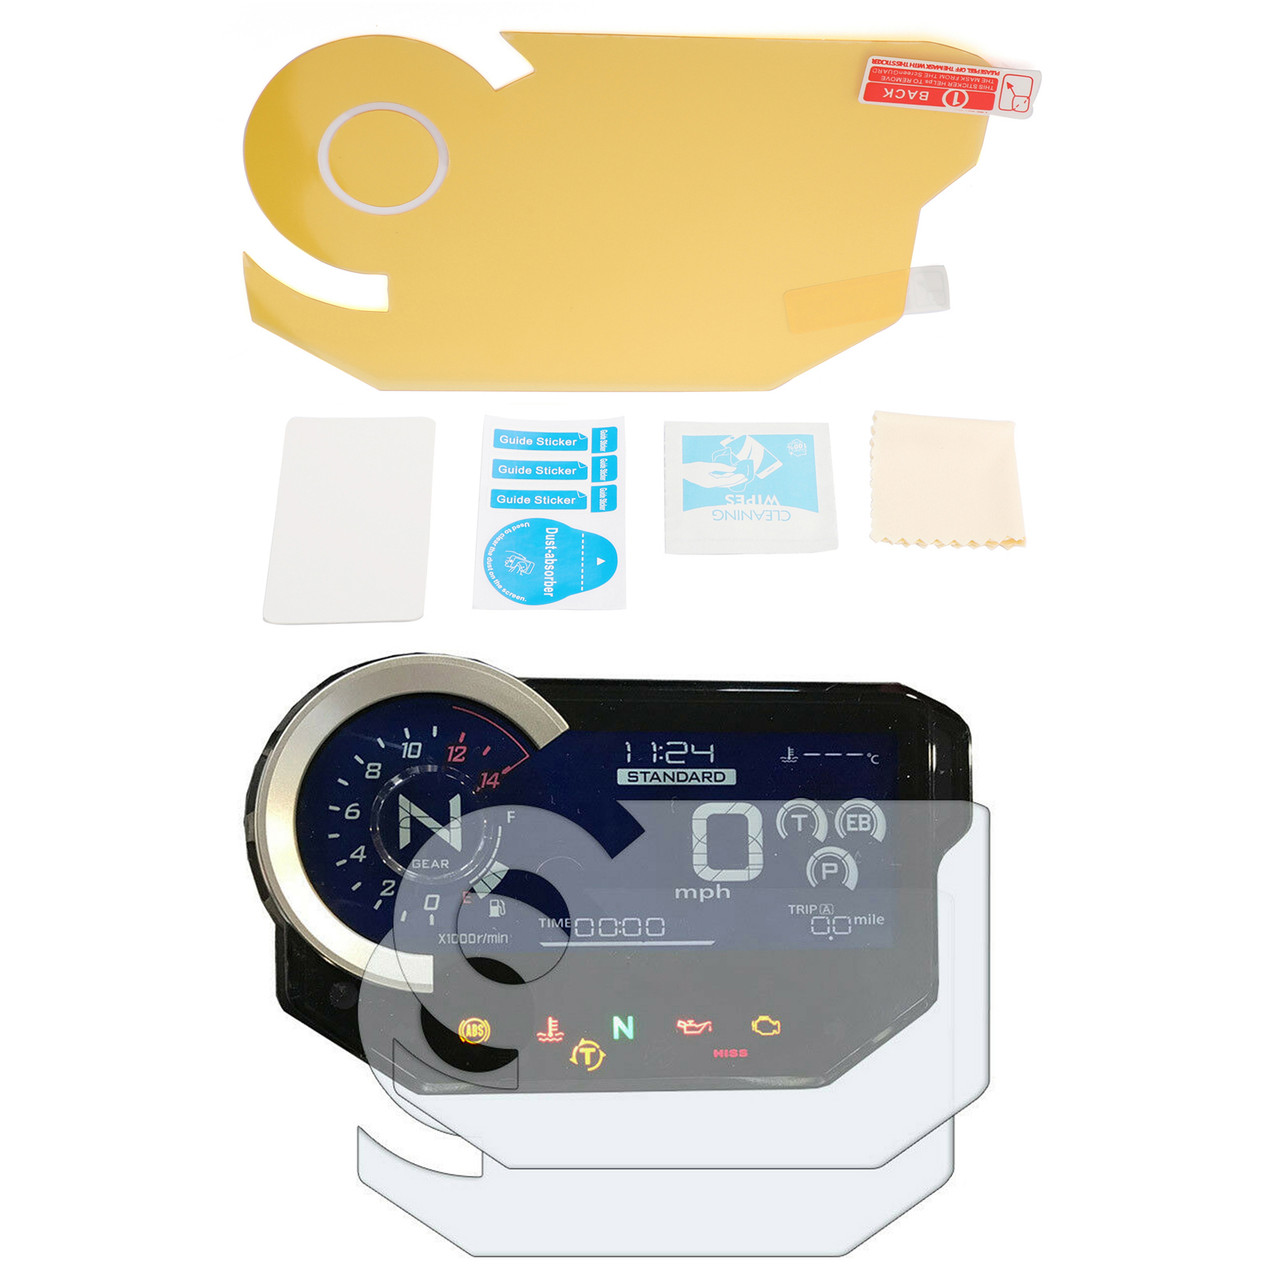 Motorcycle Dashboard Tachometer Speedometer Film Sticker For Ducati Diavel 11-17